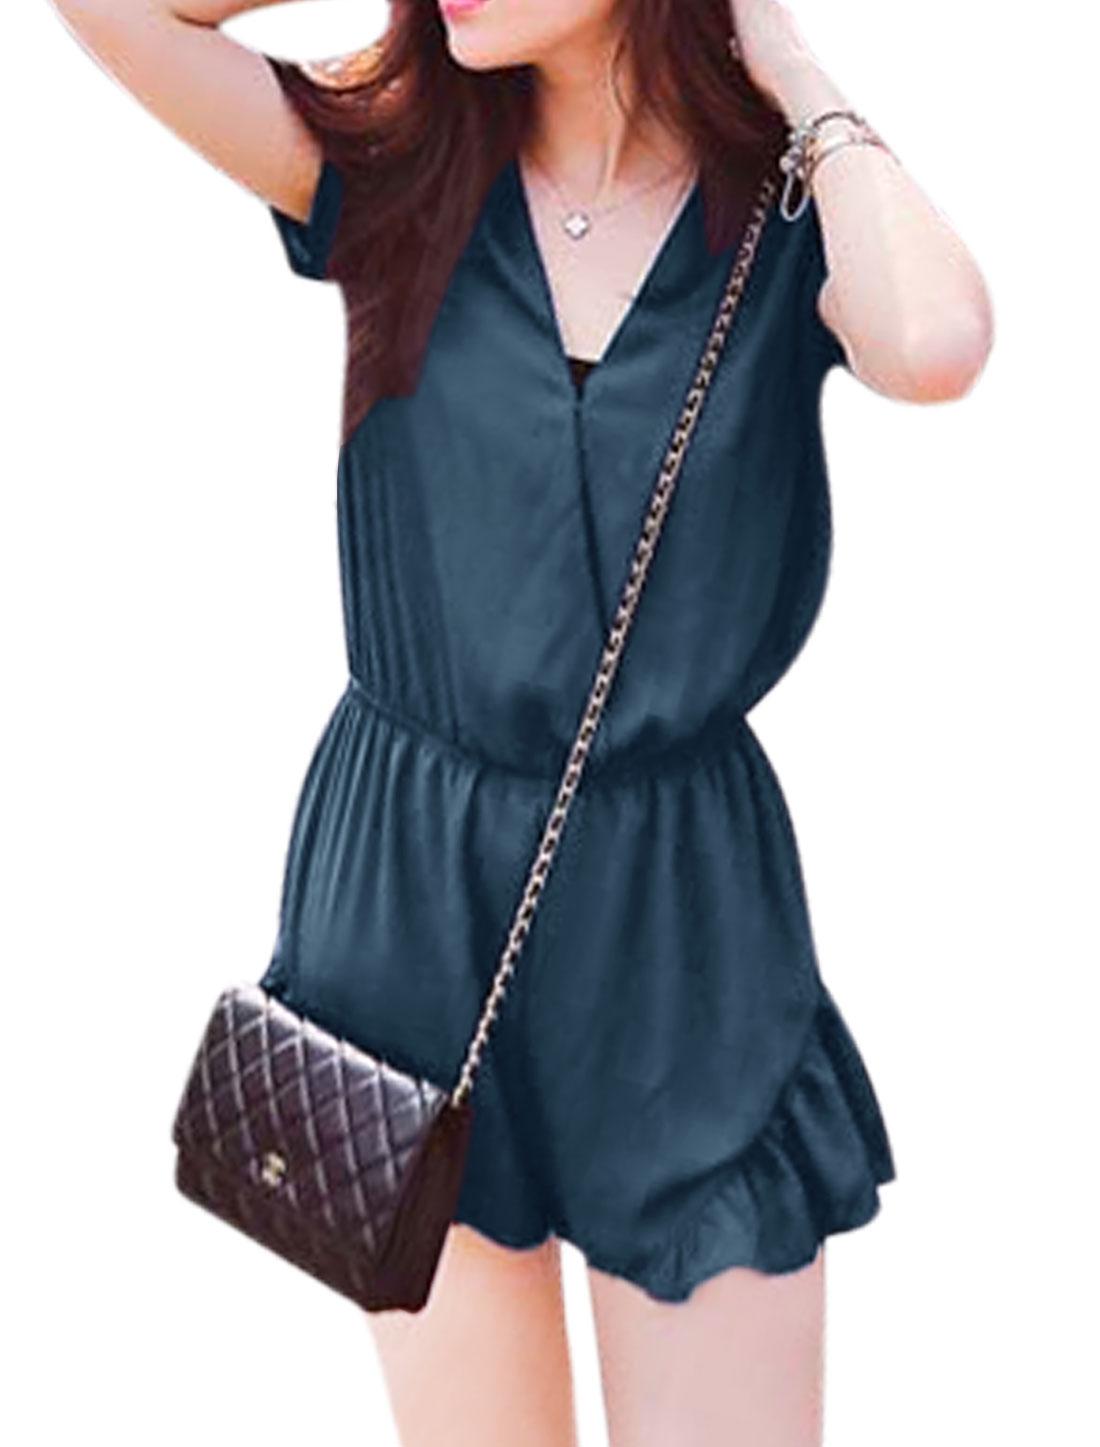 Women Short Sleeve Deep V Neck Elastic Waist Casual Romper Navy Blue XS